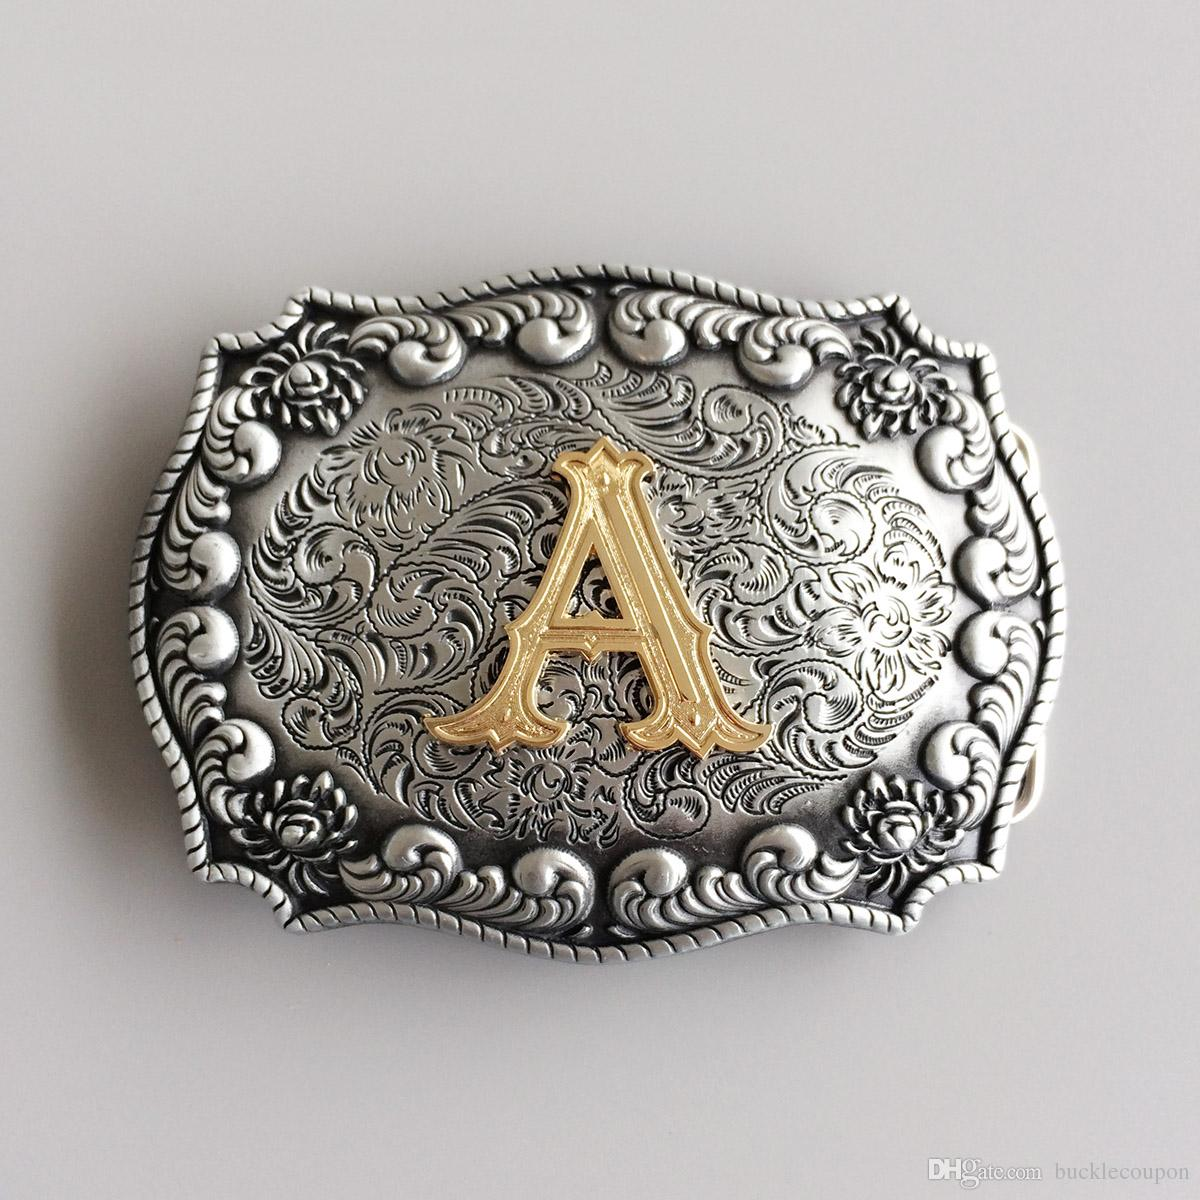 Männer Gürtelschnalle New Western Cowboy Anfangsbuchstaben A - L Gürtelschnalle Gürtelschnalle Boucle de ceinture SCHNALLE-LE010A Brand New